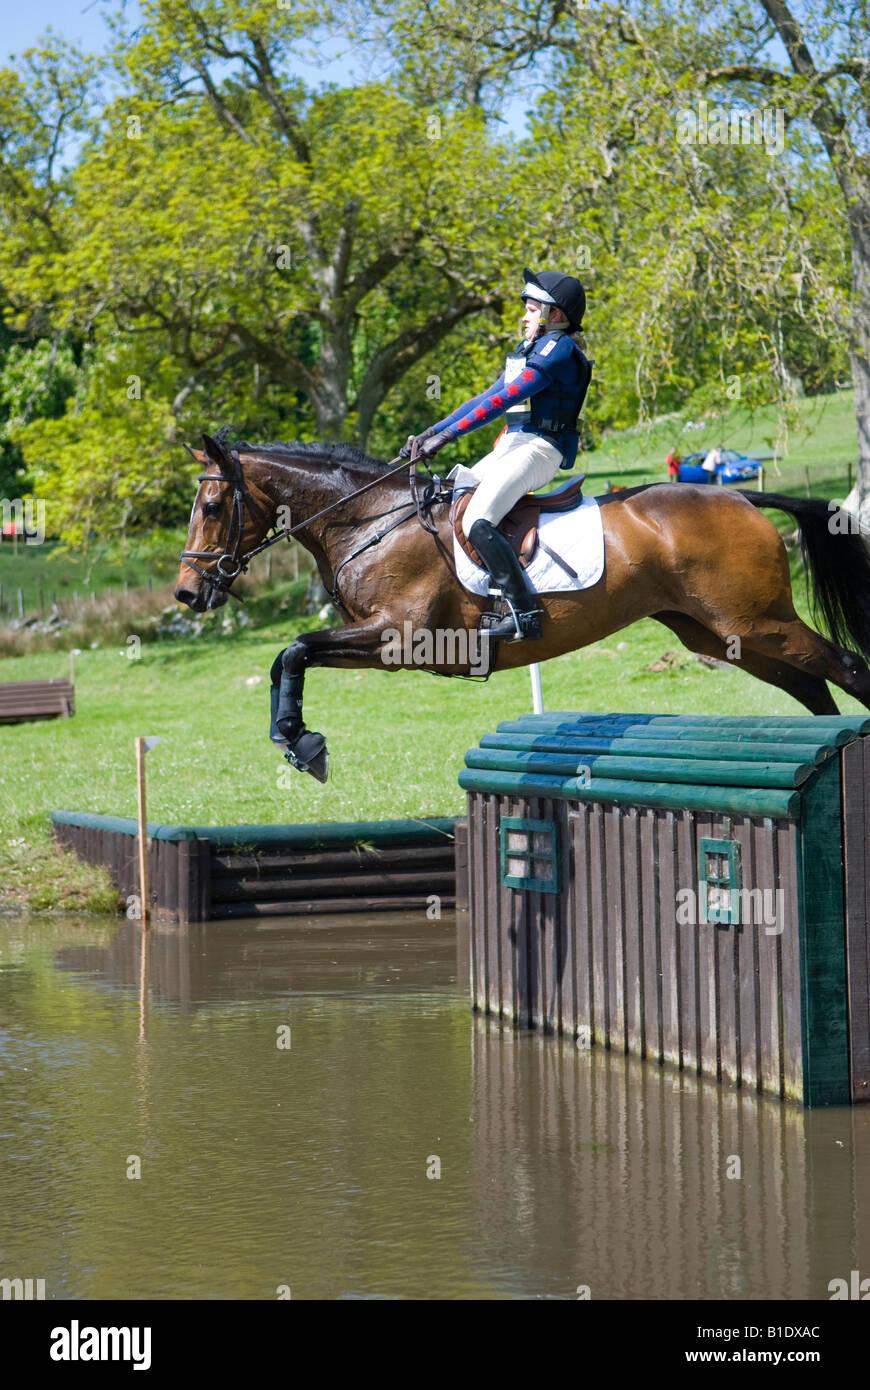 Competitor at Scotsburn Horse Trials, Scotland, Great Britain - Stock Image